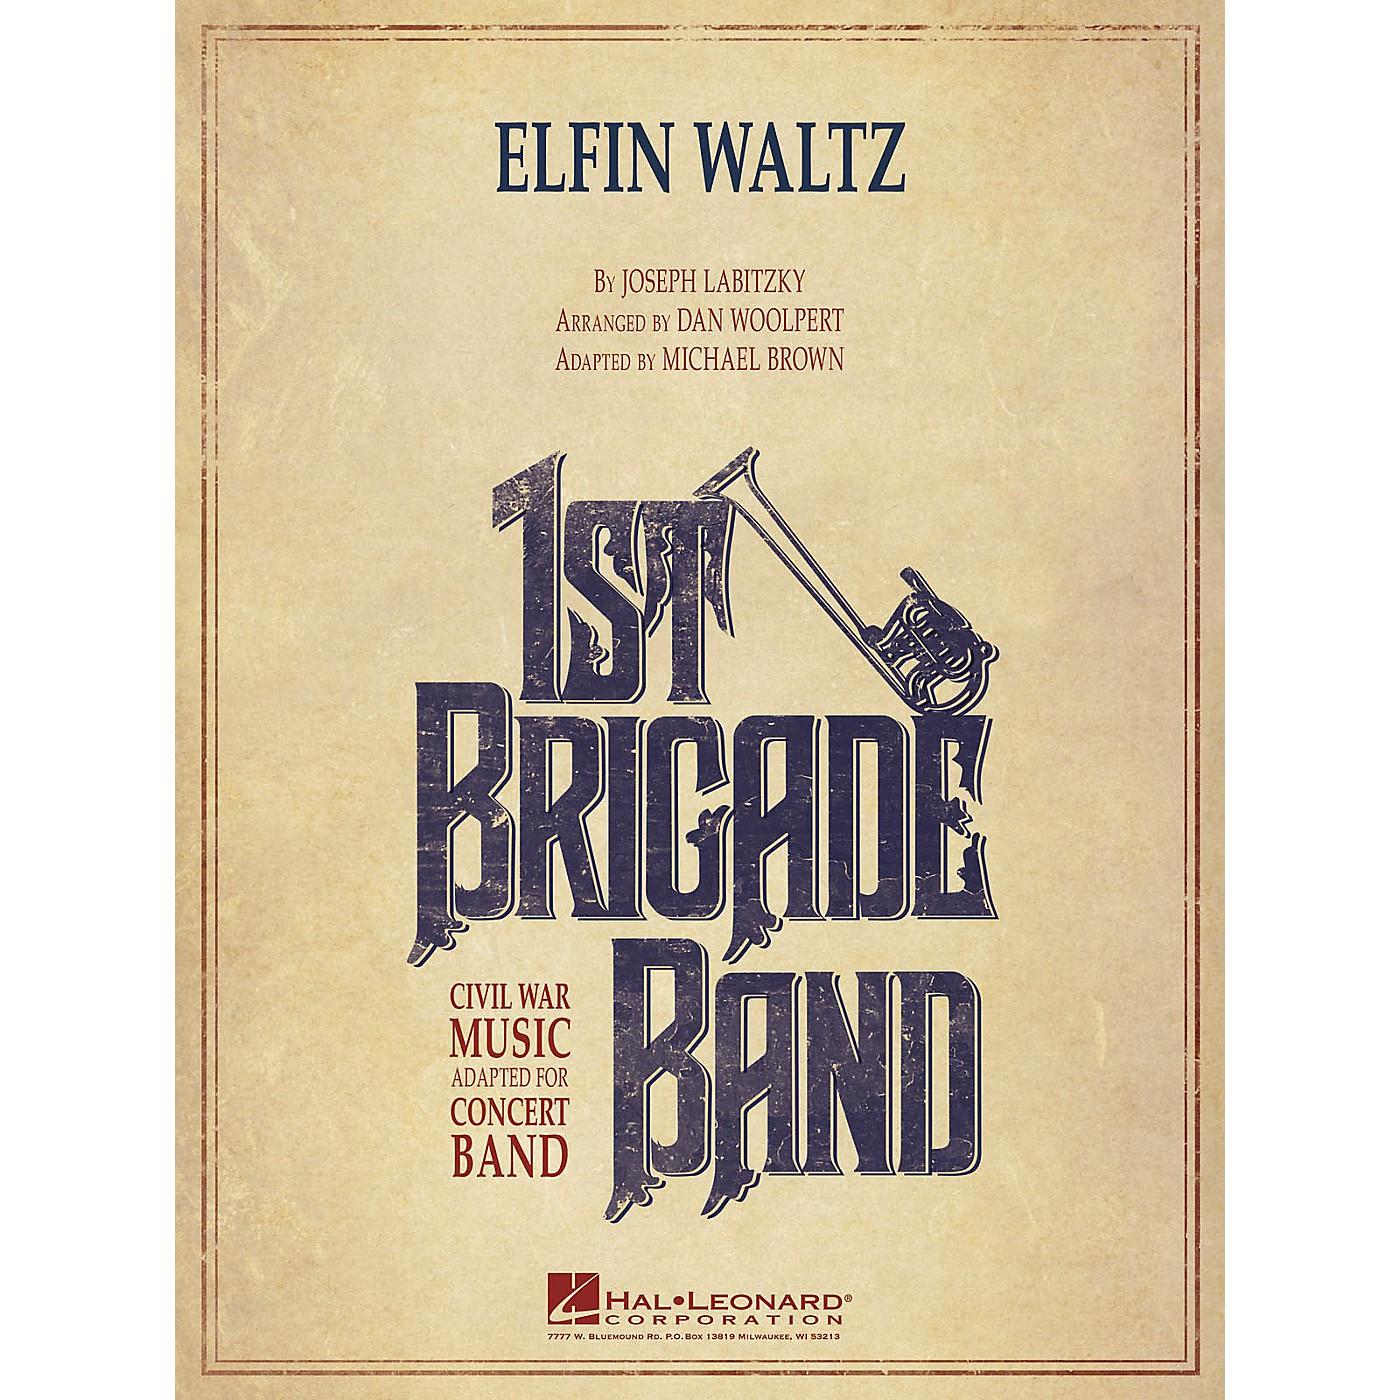 Hal Leonard Elfin Waltz Concert Band Level 3-4 Arranged by Dan Woolpert thumbnail